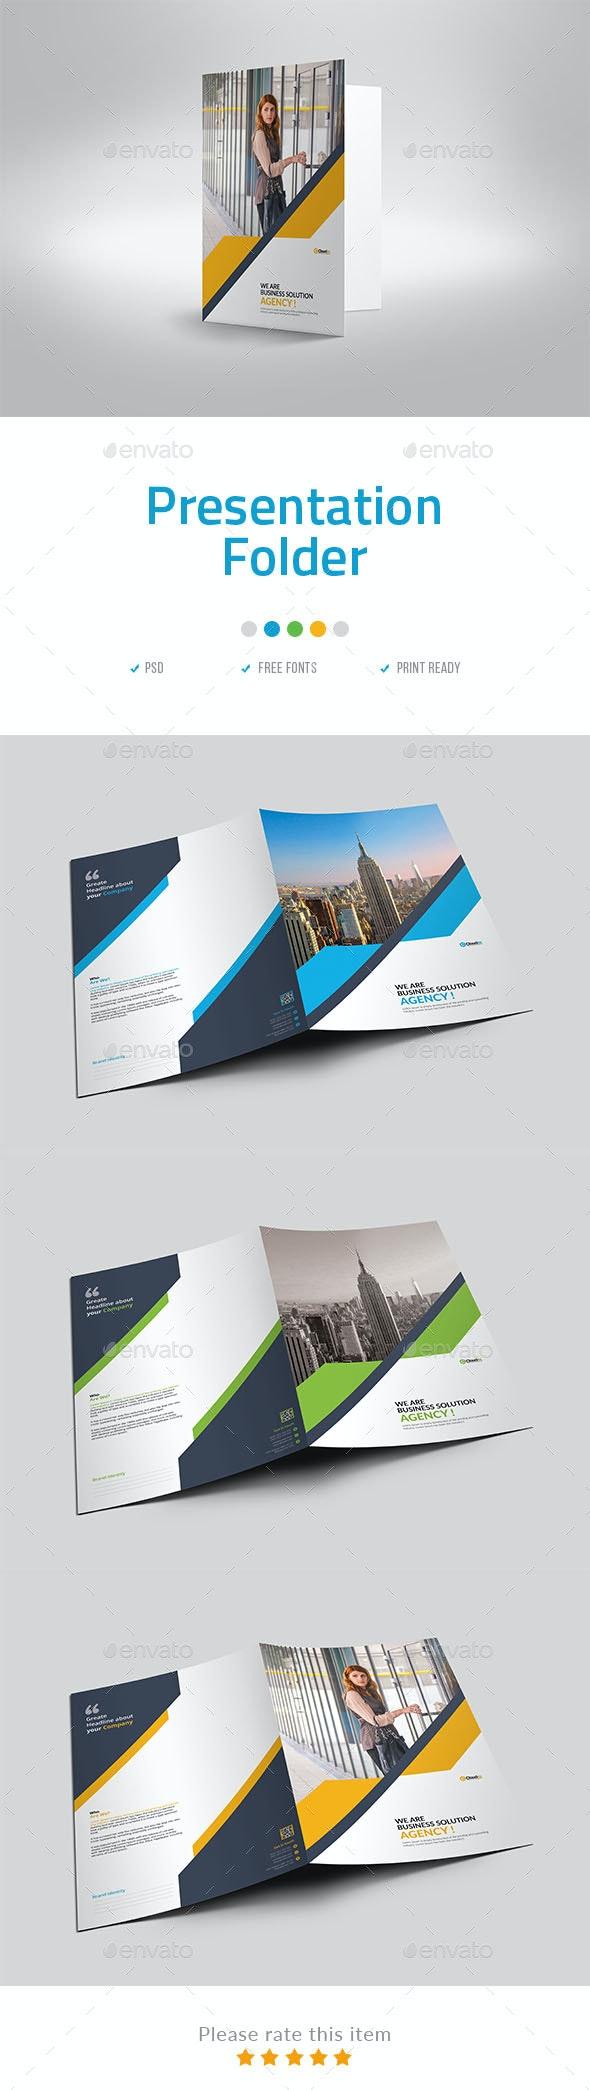 Presentation Folder Template - Stationery Print Templates